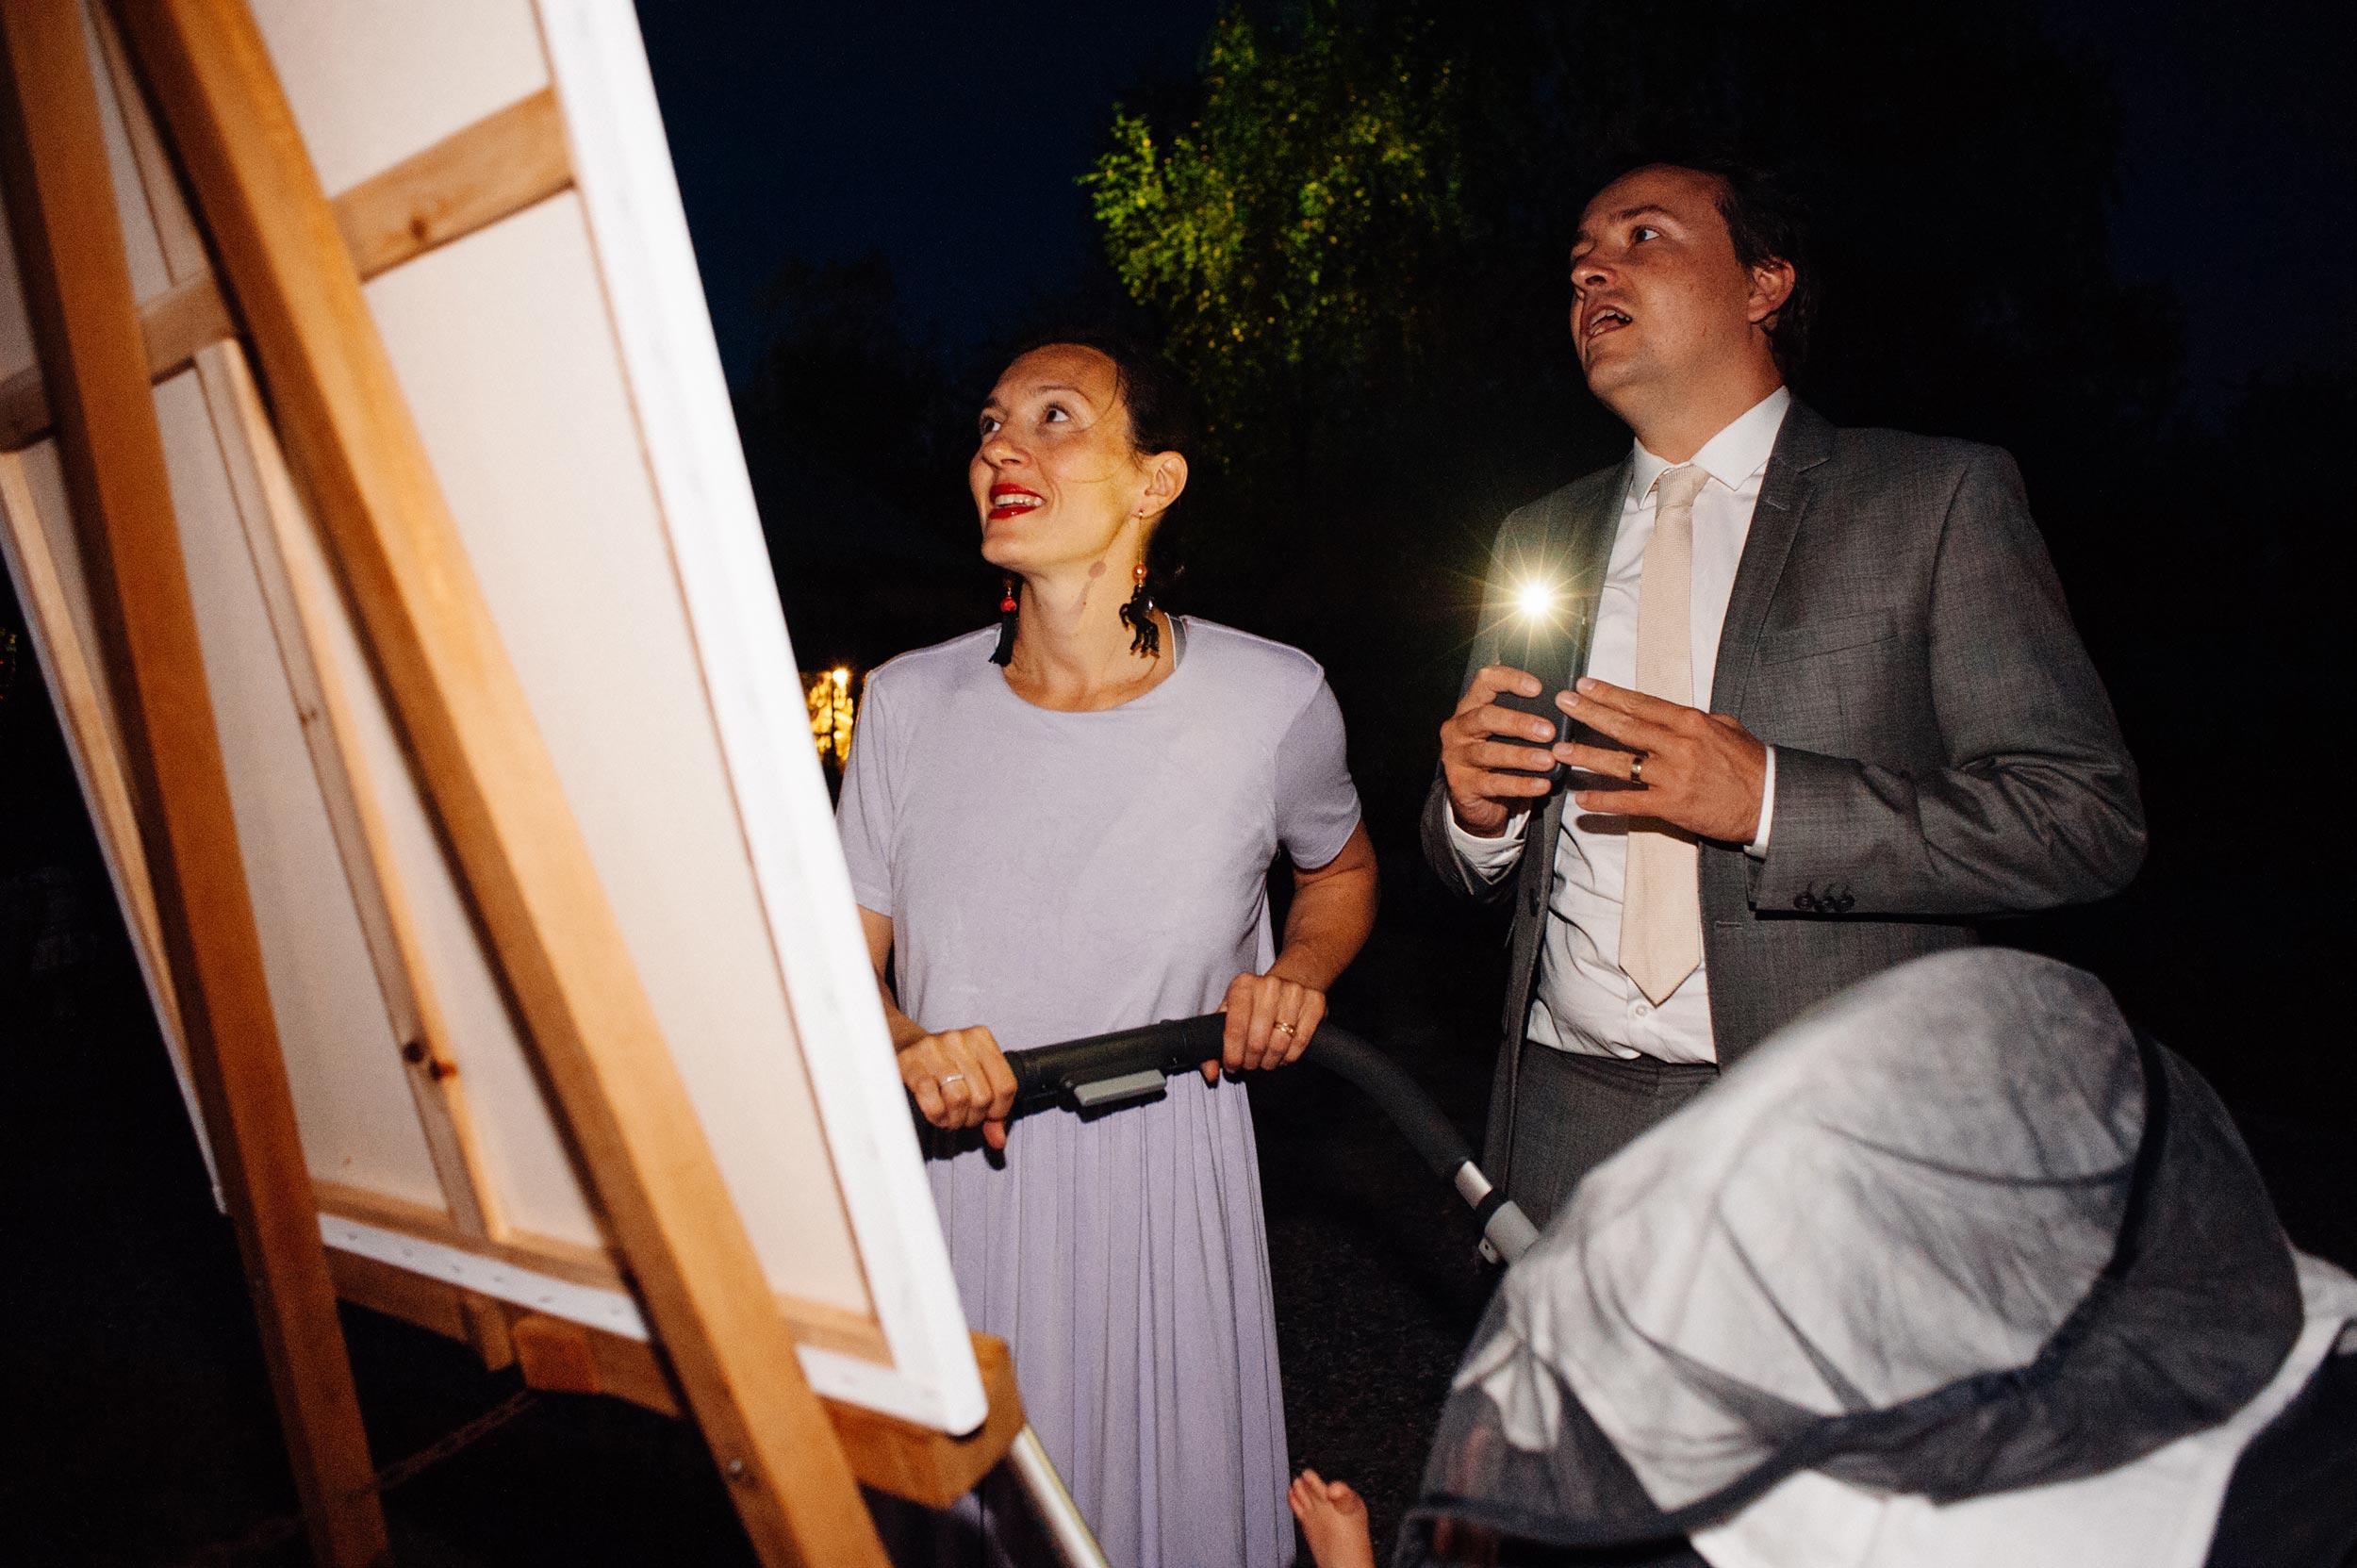 2016-Davor-Chiara-Monferrato-Asti-Vercelli-Wedding-Photographer-Italy-Alessandro-Avenali-68.jpg